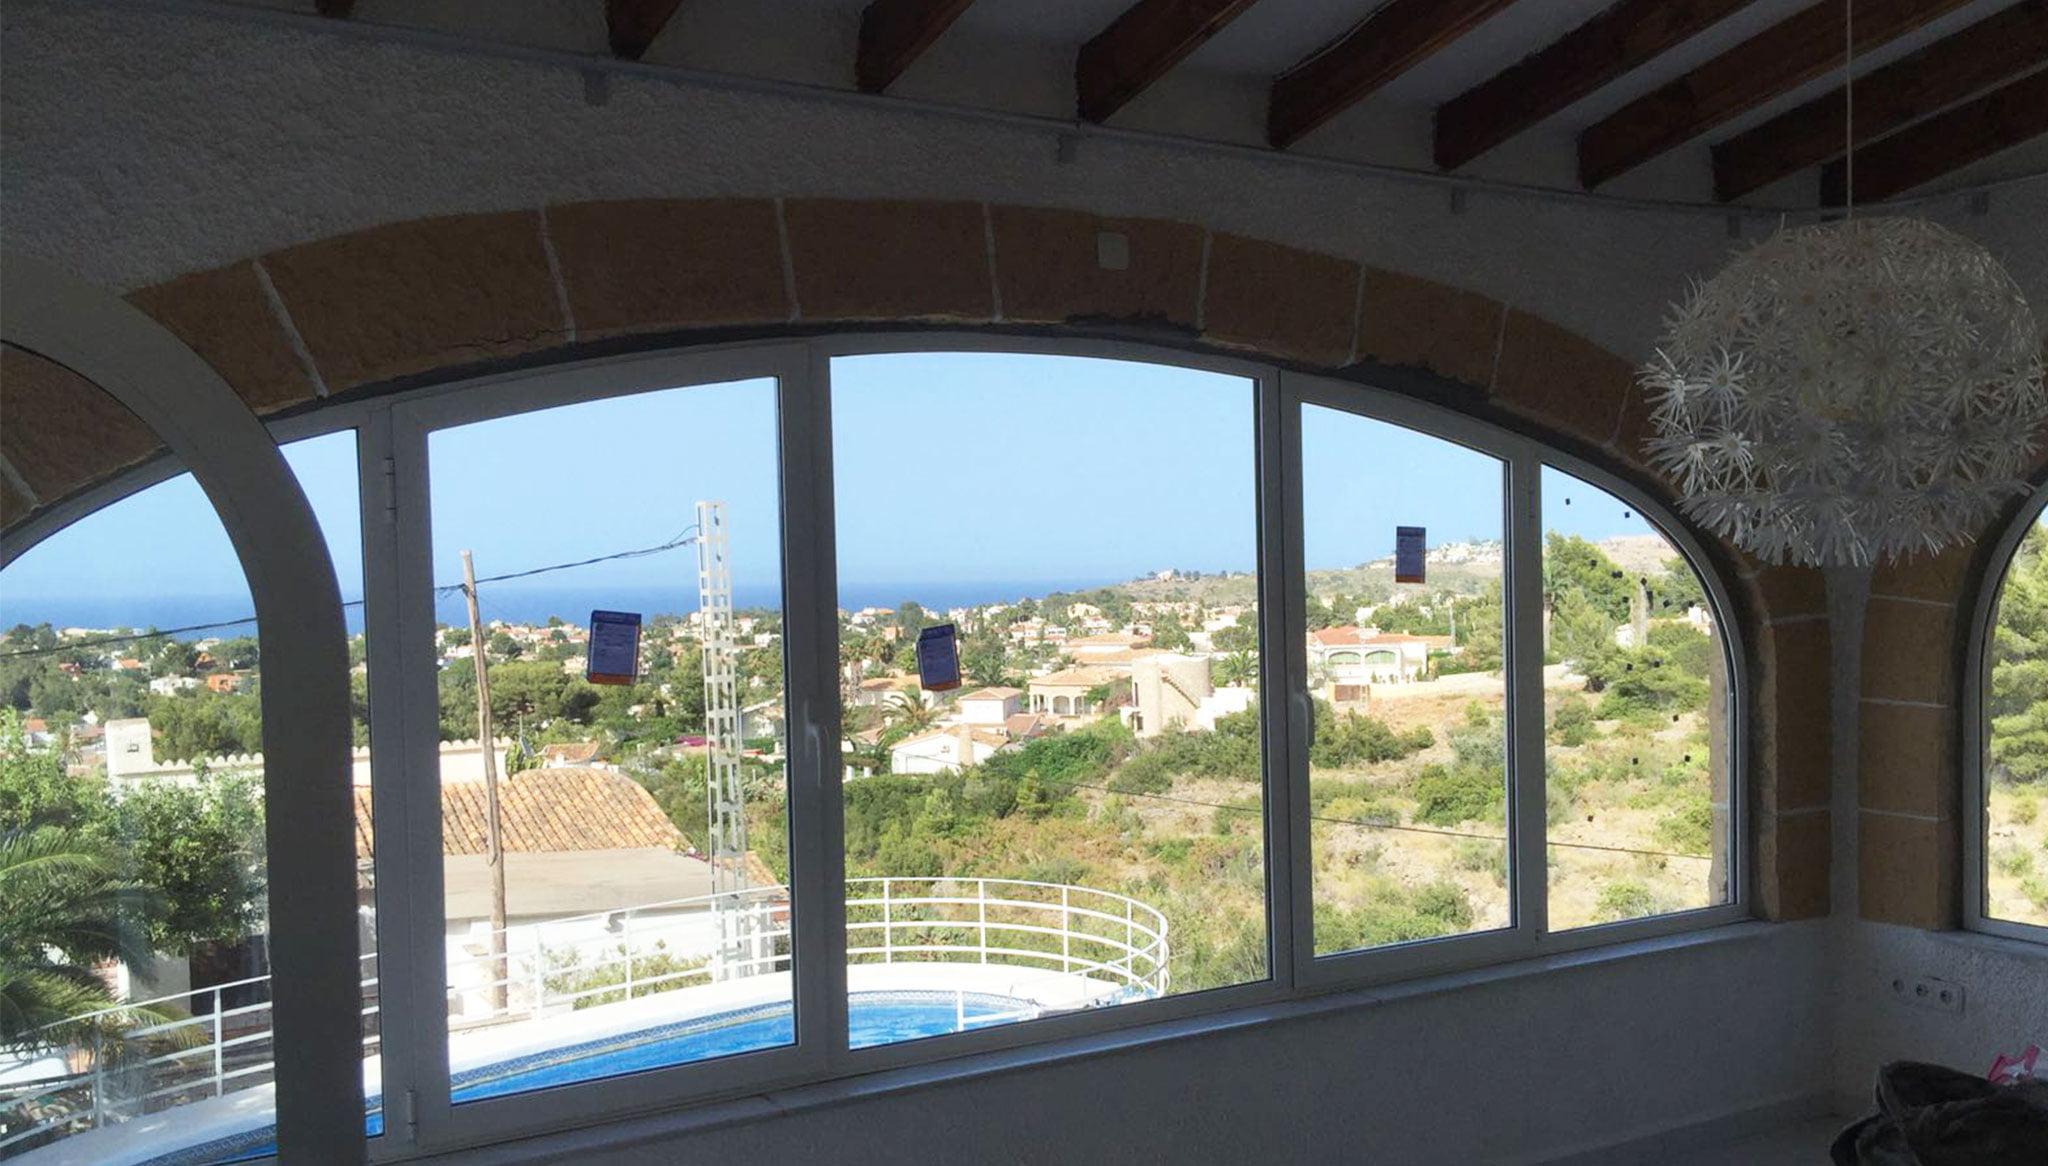 Fenêtre incurvée ajustée à une arche - Alucardona Pvc y Aluminios, SL